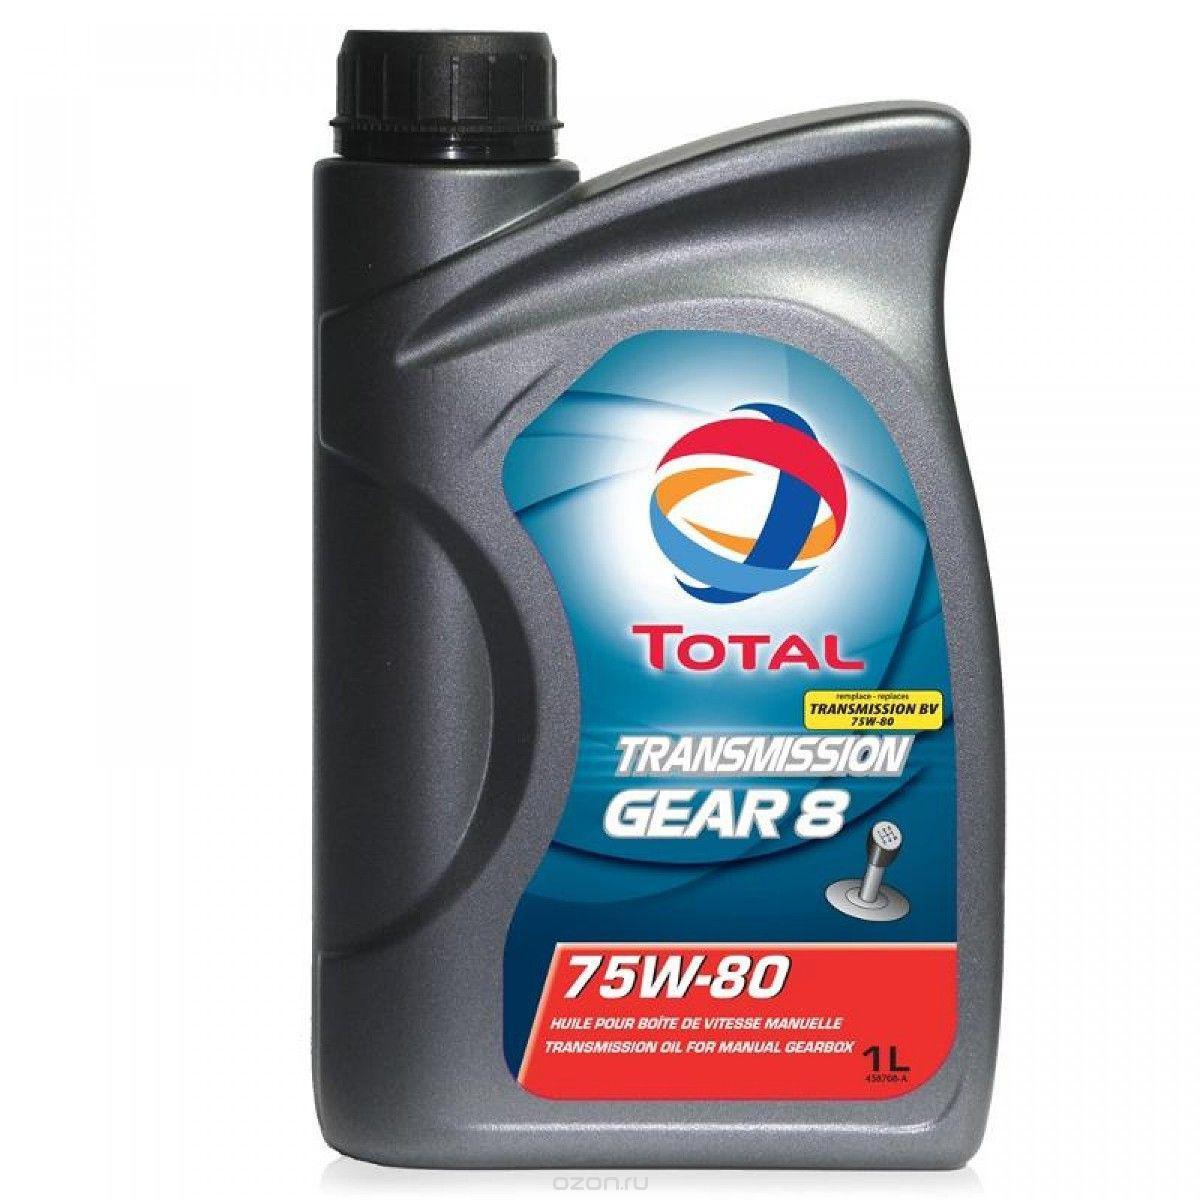 Total Transmission Gear 8 75W-80 1л